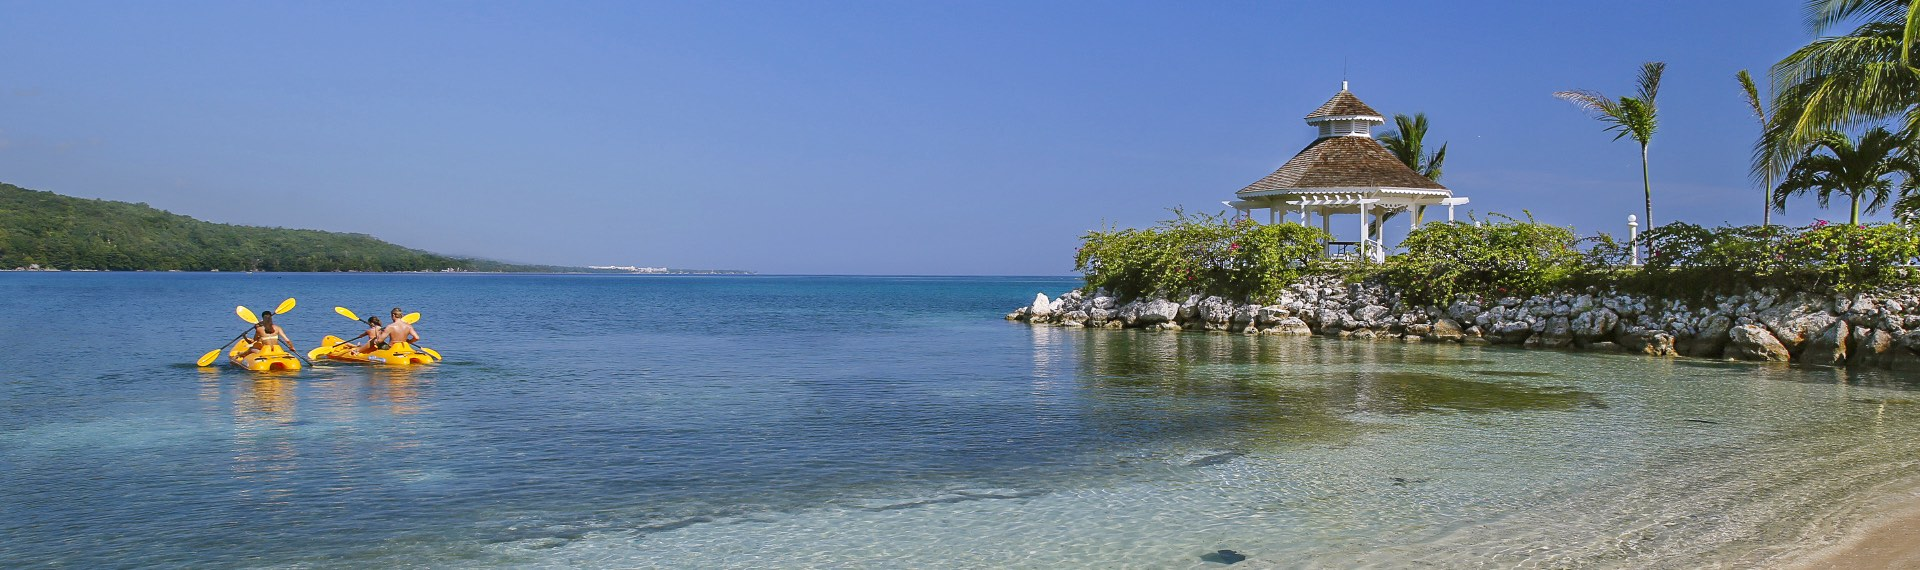 Vacations, Beachside Jog, Surf, Paddling, Kayaking, Aqua Spinning, stay fit